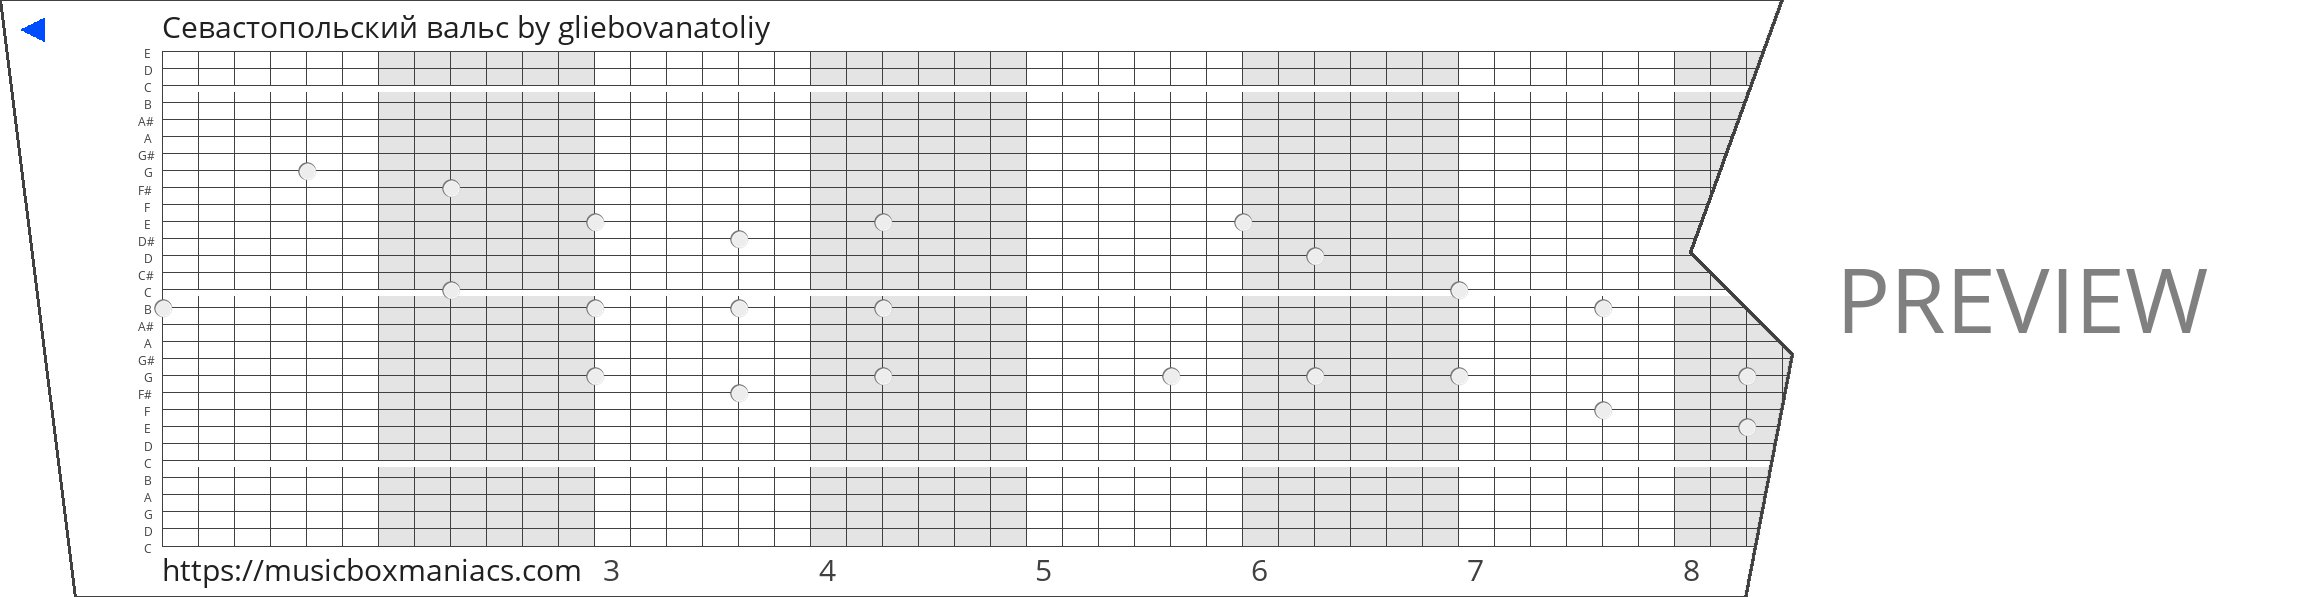 Севастопольский вальс 30 note music box paper strip